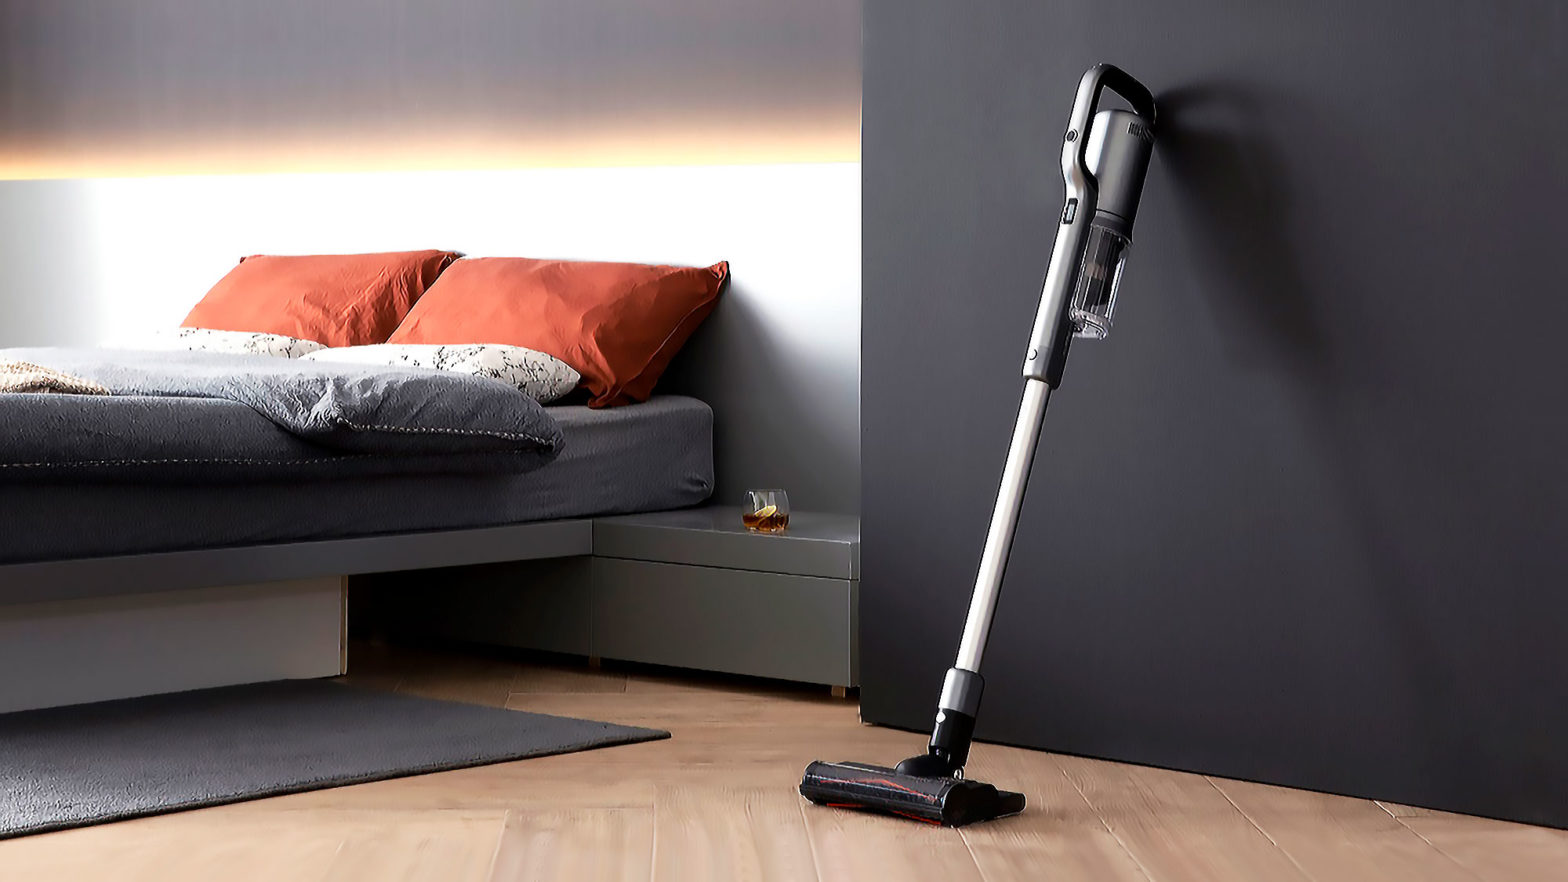 Roidmi X30 Pro Cordless Stick Vacuum Cleaner